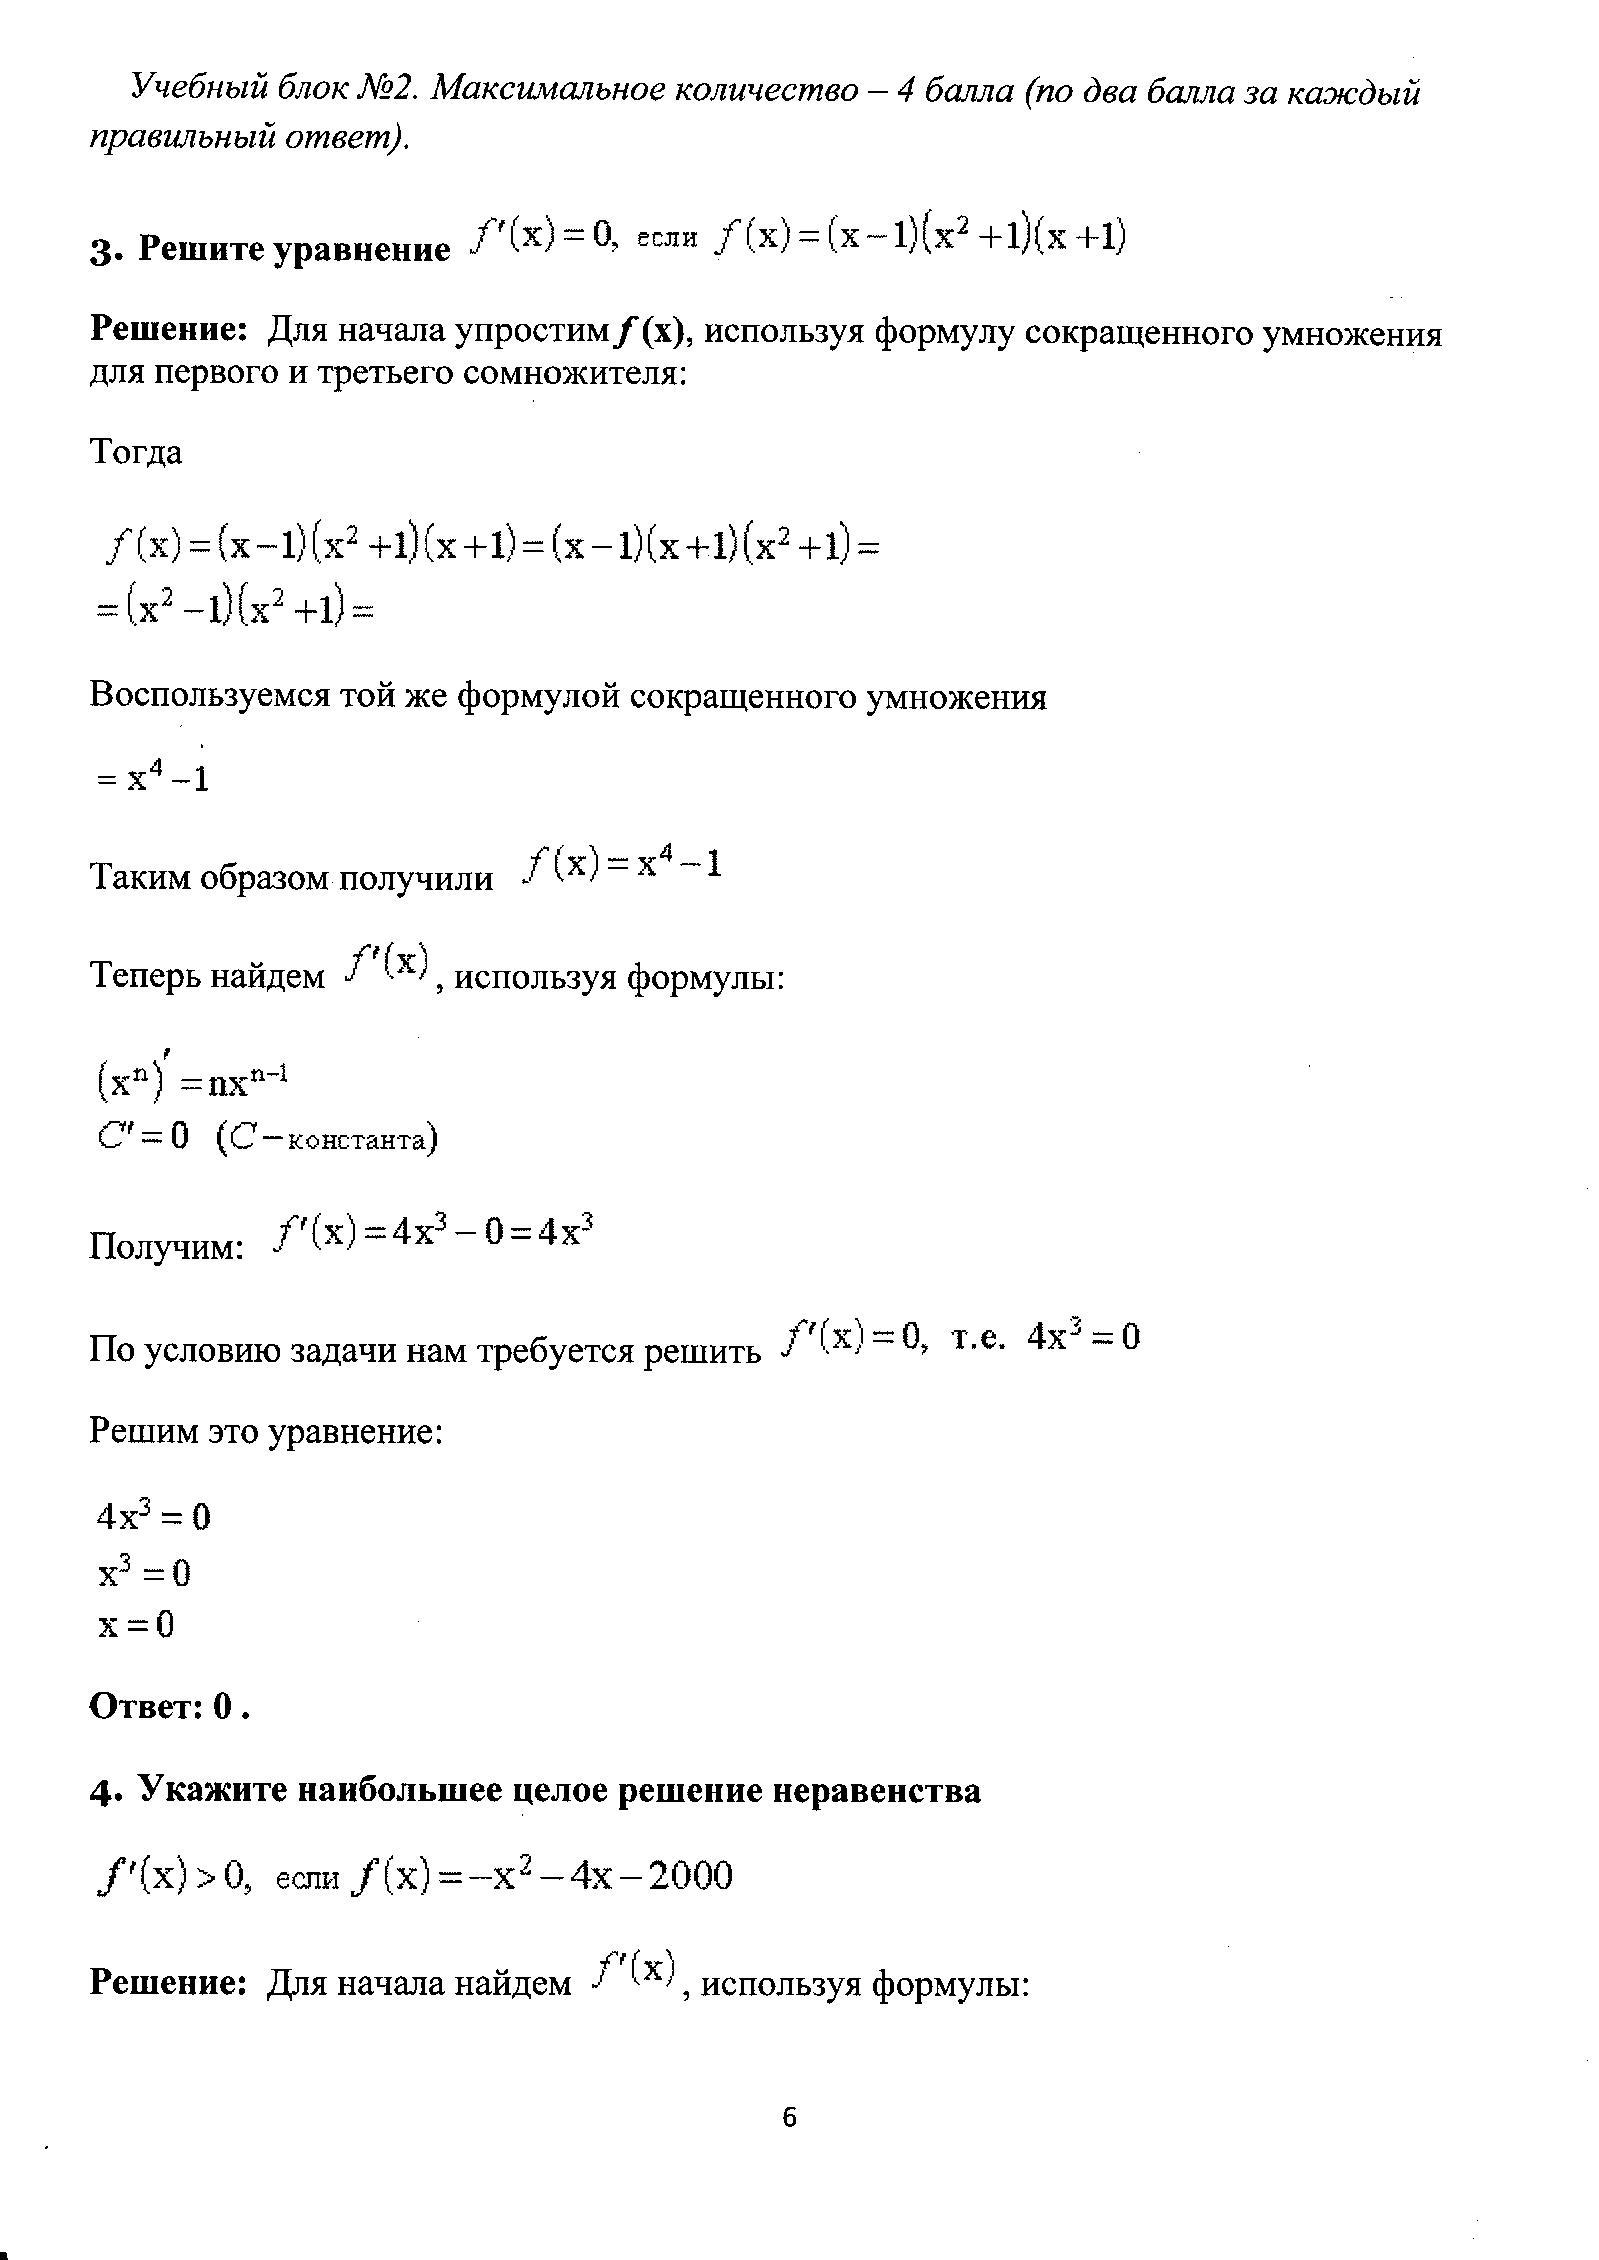 C:\Documents and Settings\Юлия\Мои документы\Мои рисунки\MP Navigator EX\2012_02_20\IMG_0006.tif